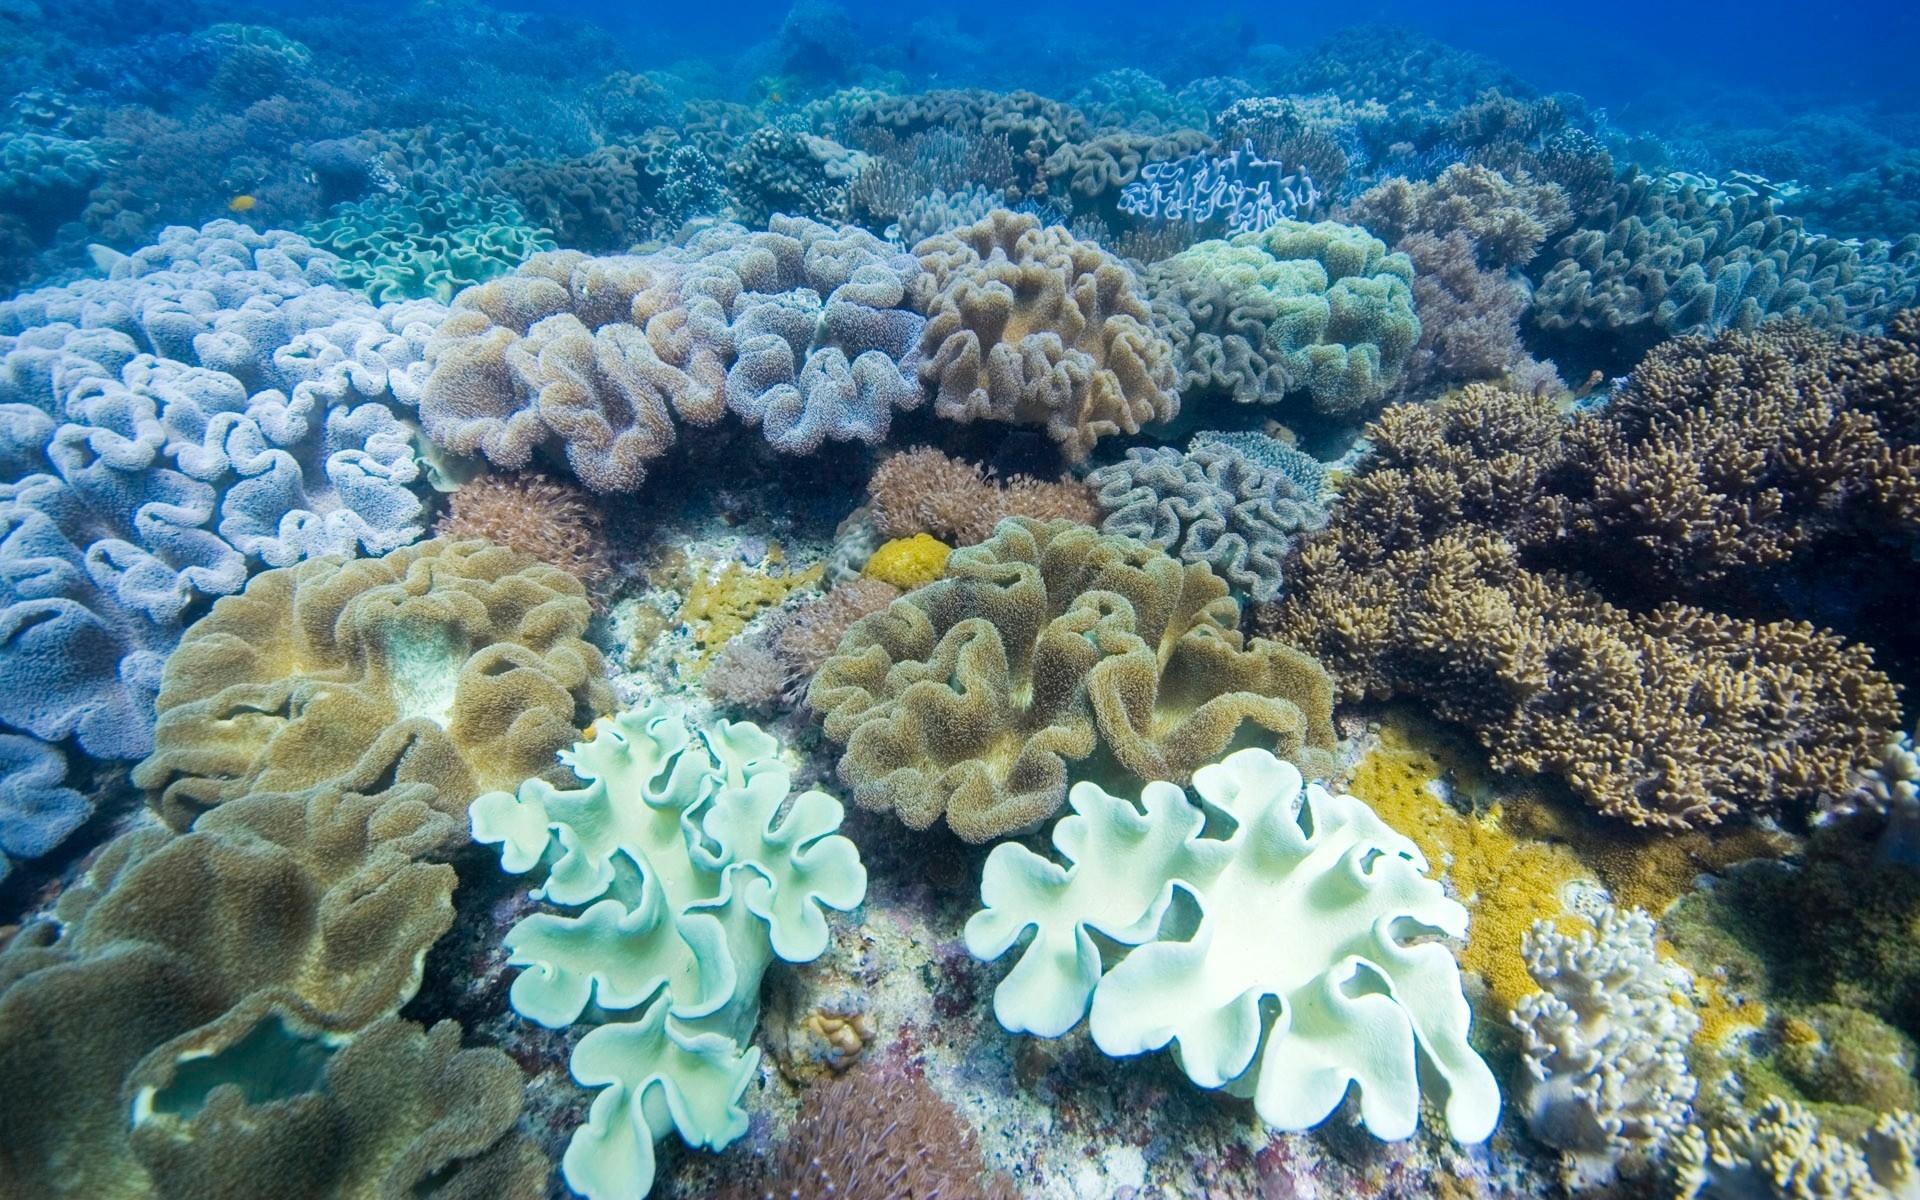 Wallpaper  seaweed, underwater, multi colored, surface 20x20 ...